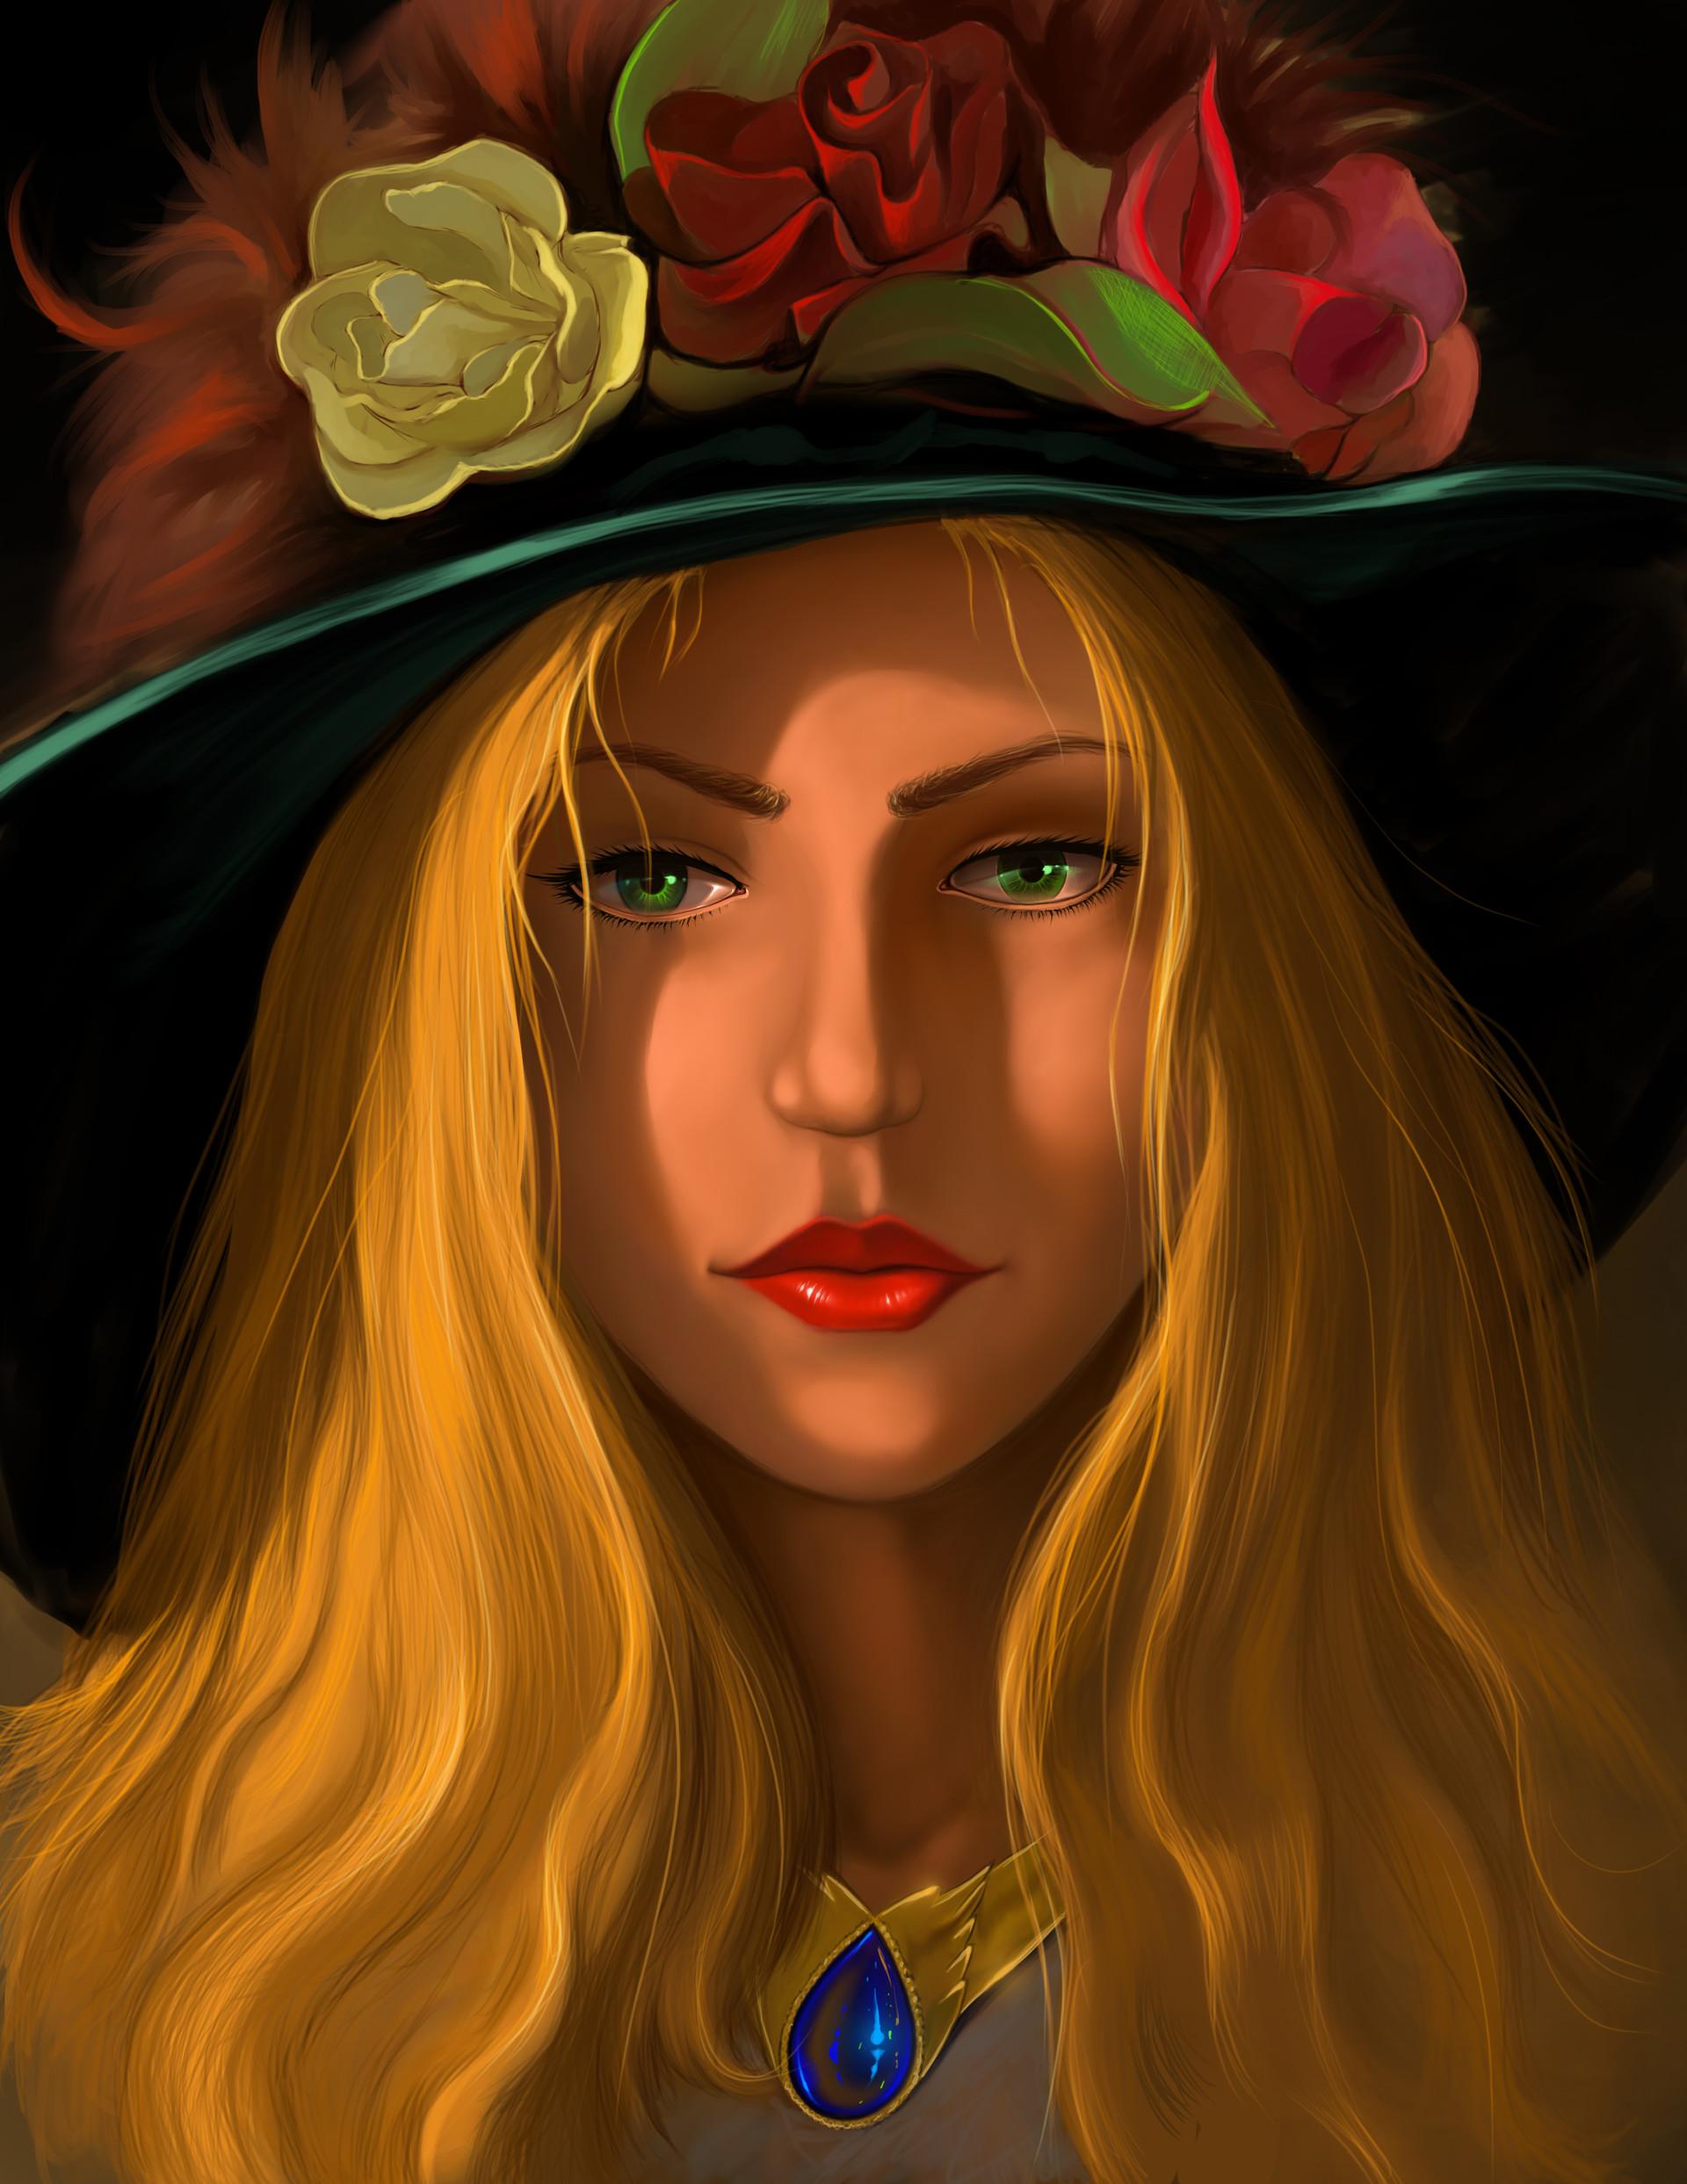 Blonde Woman Art